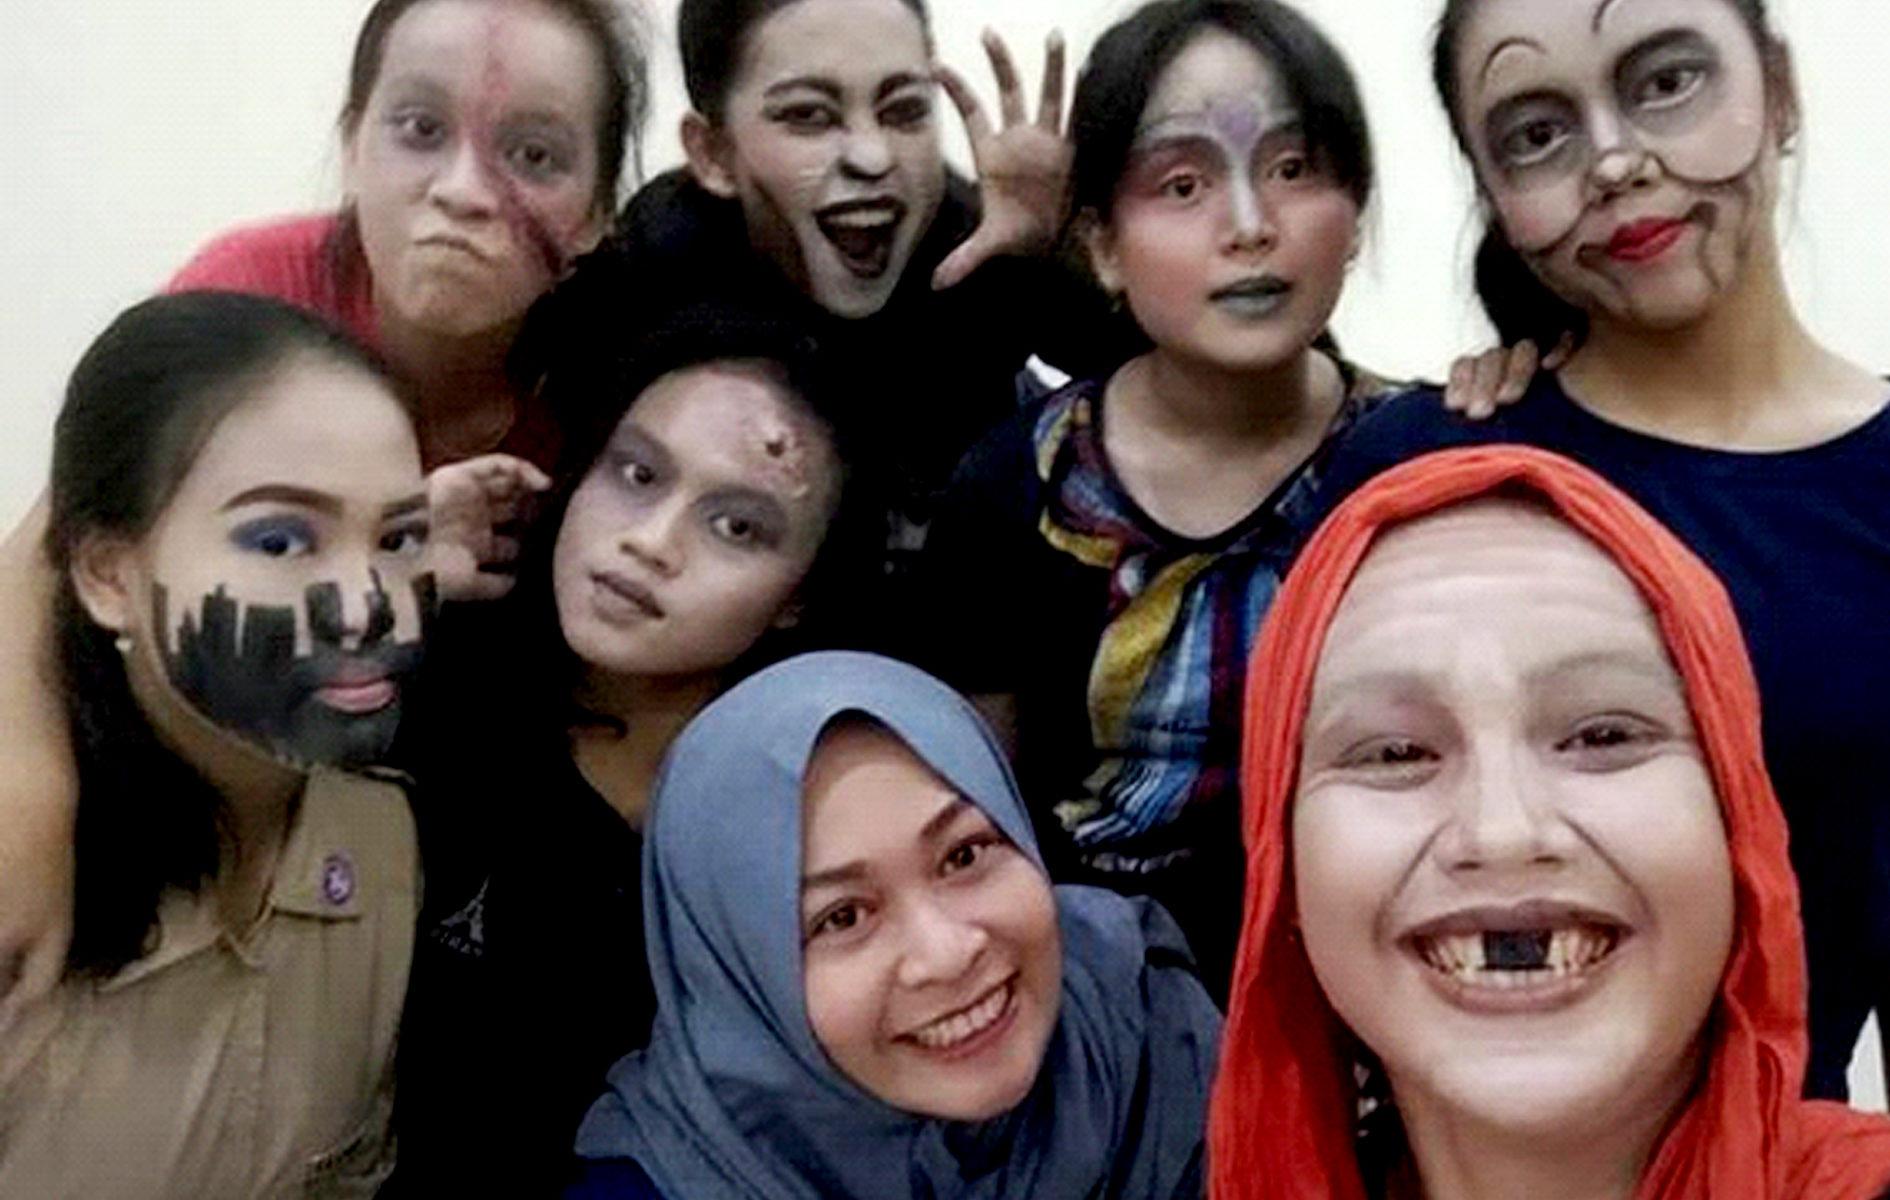 kelas makeup fantasi gandes pamantes